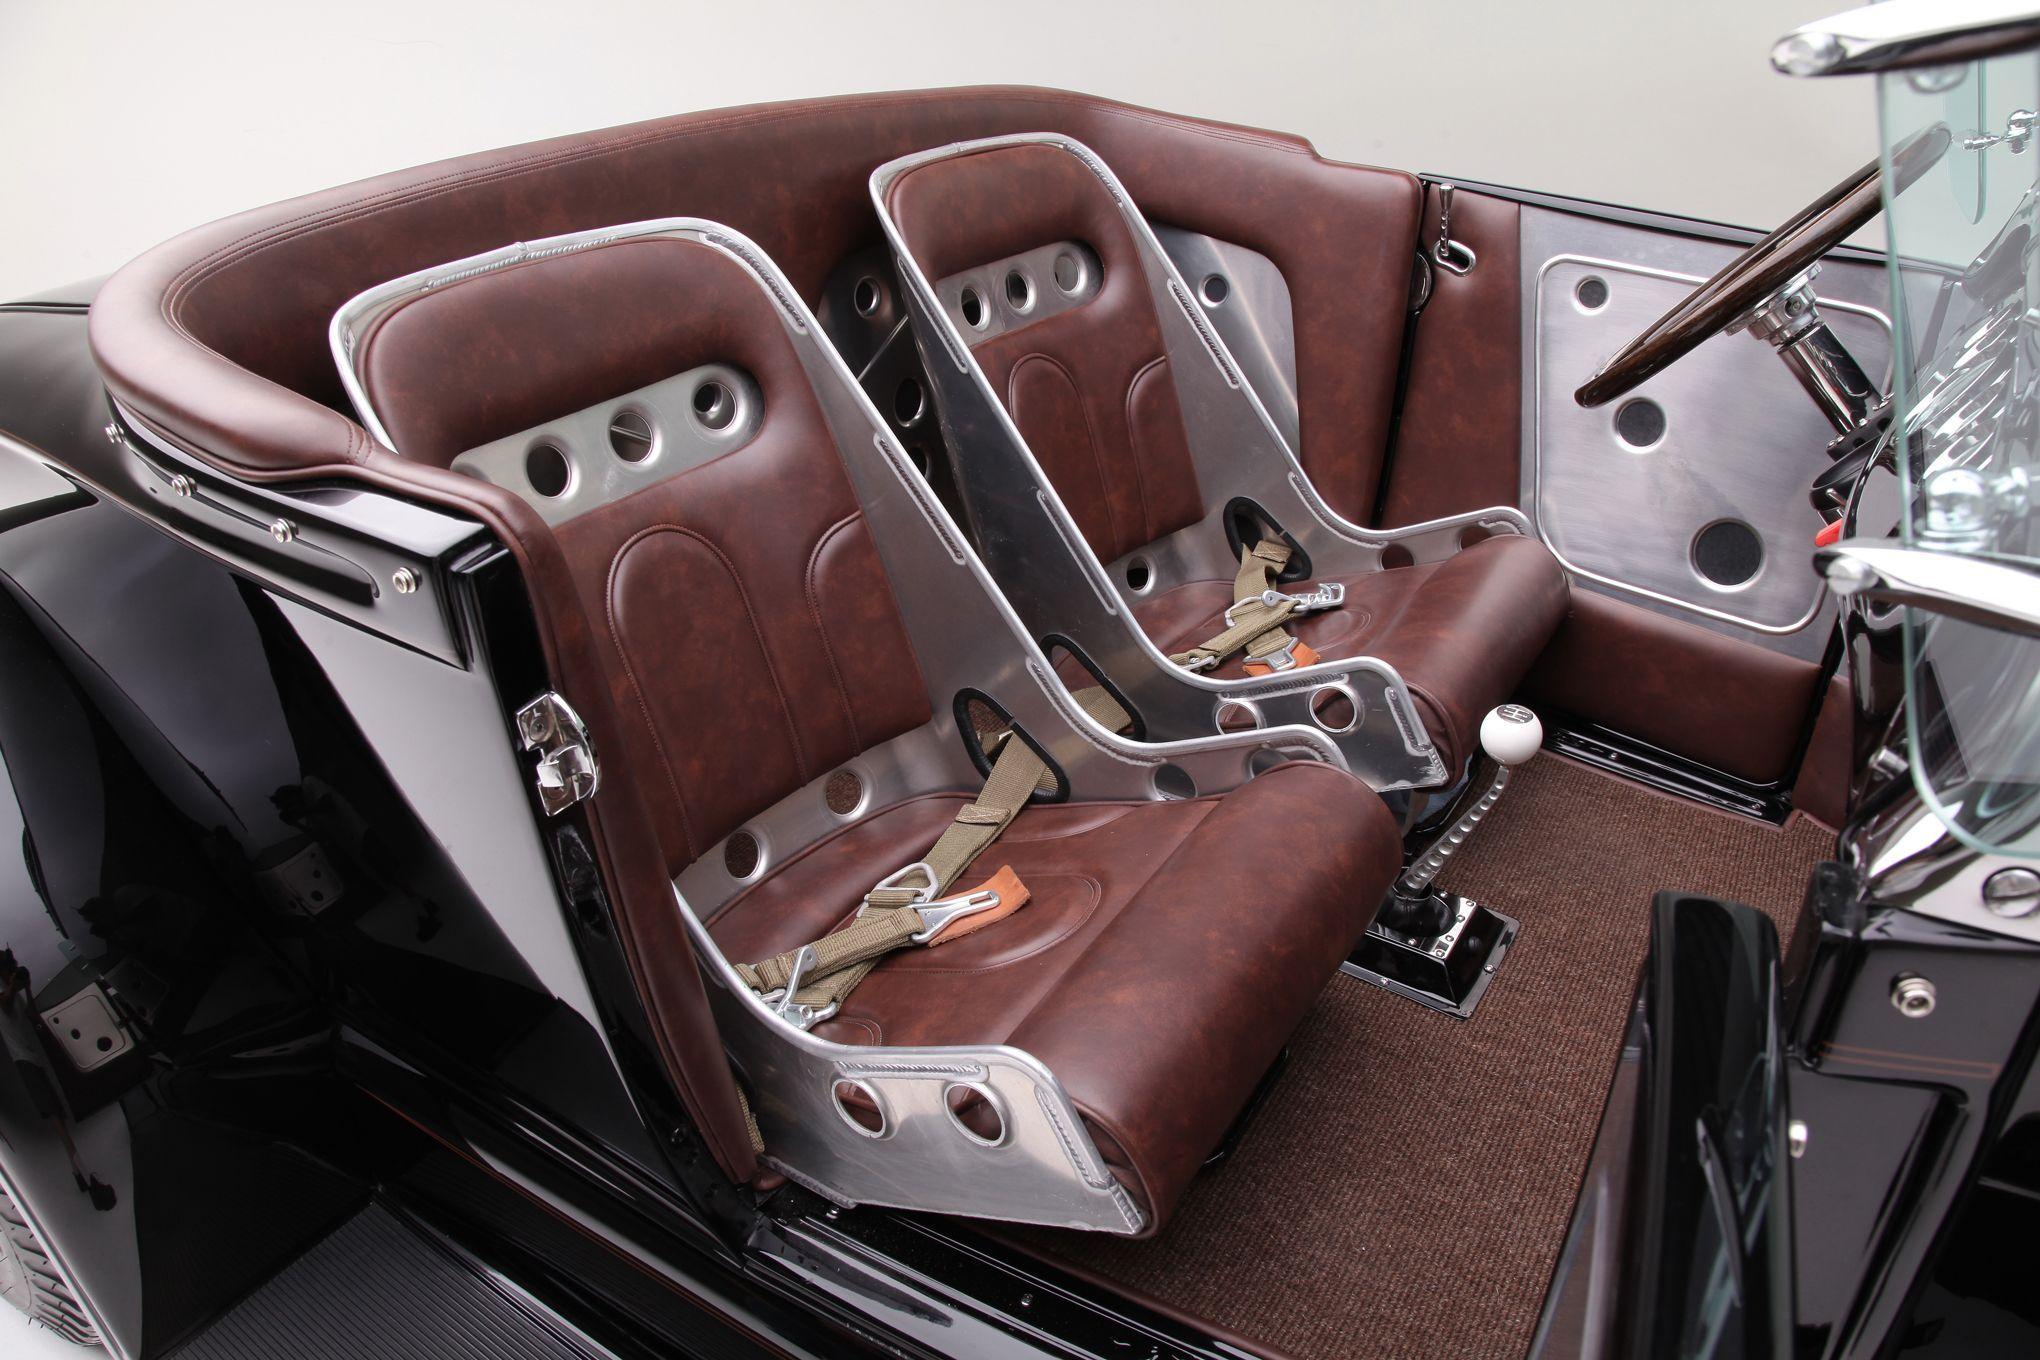 008 1929 ford roadster aluminum 2040 1360 vans pinterest rats cars and interiors. Black Bedroom Furniture Sets. Home Design Ideas